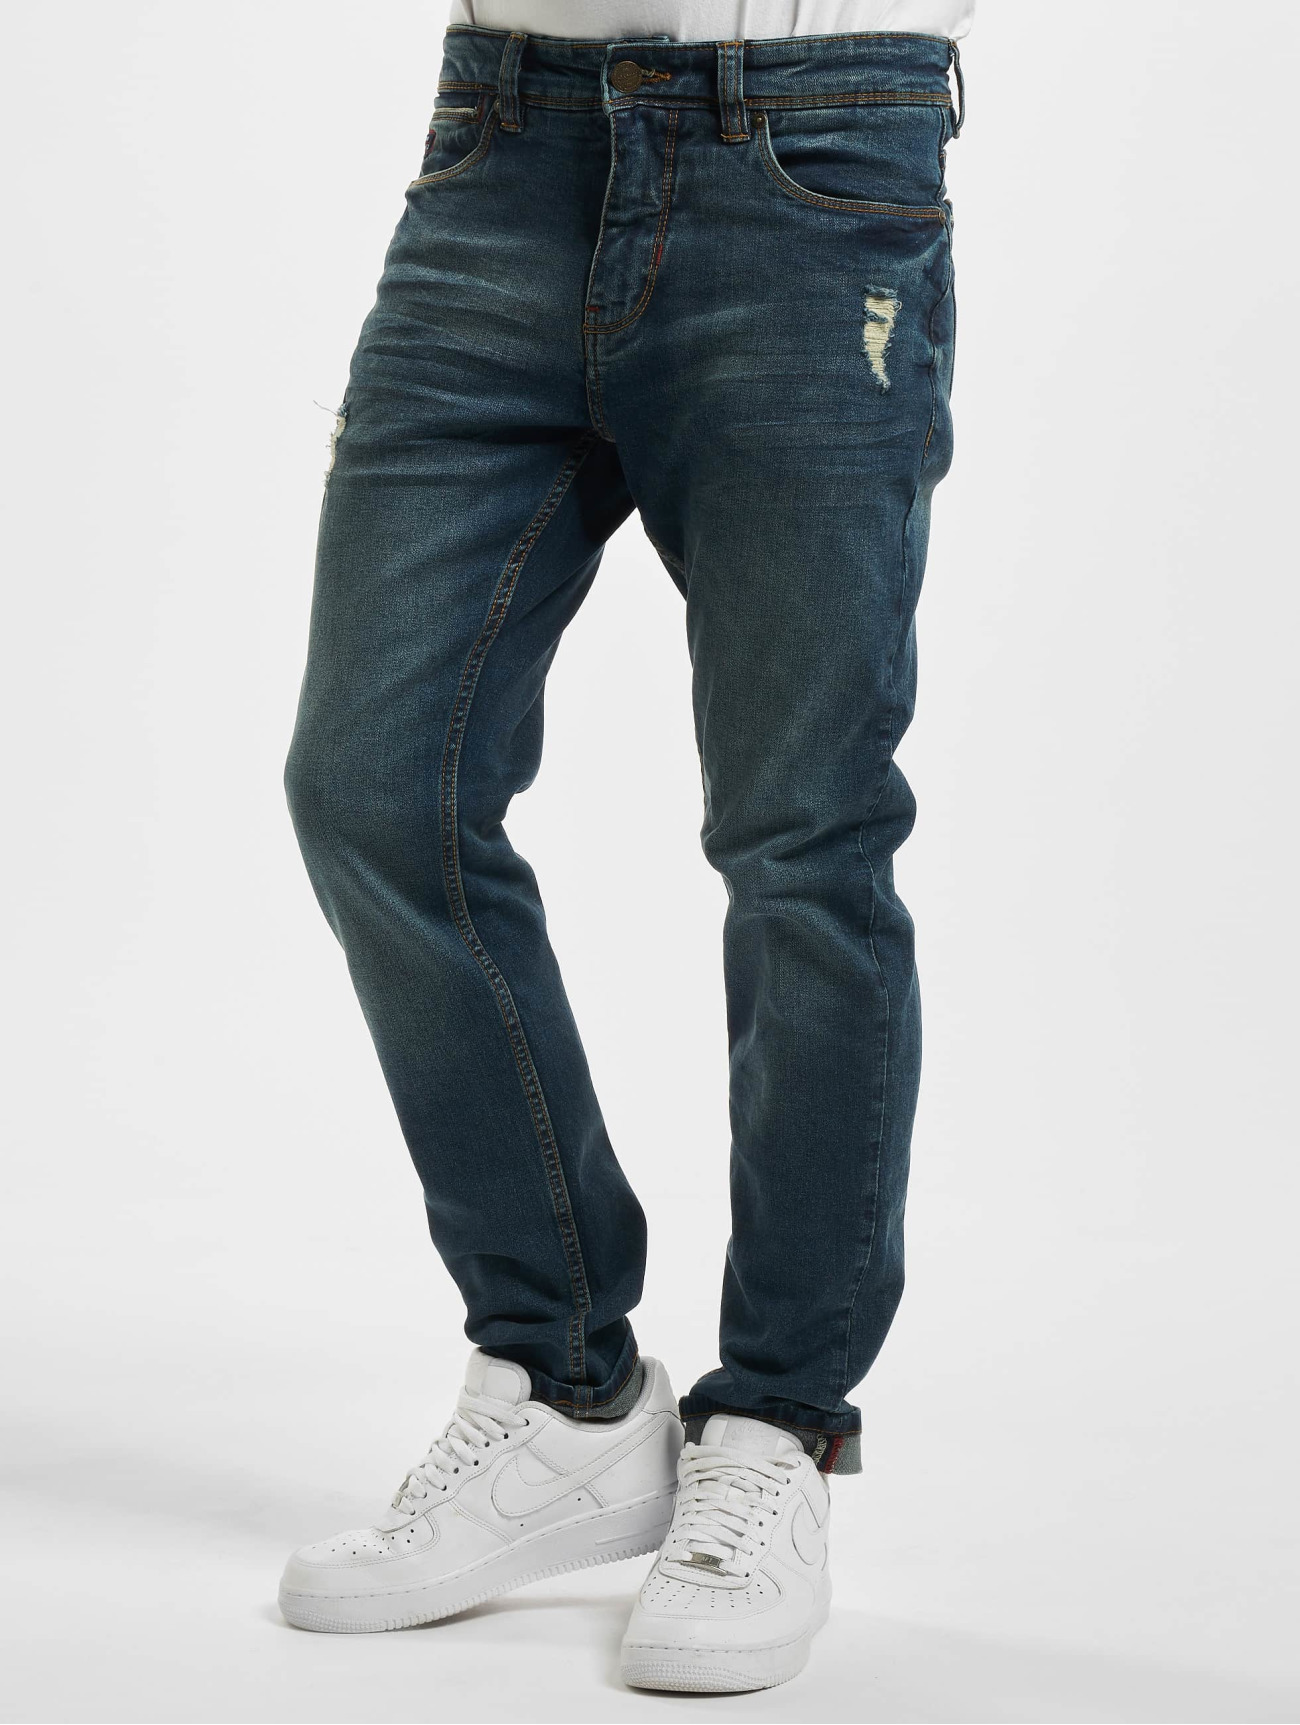 Sublevel  Loys   bleu Homme Jean slim  774678 Homme Jeans